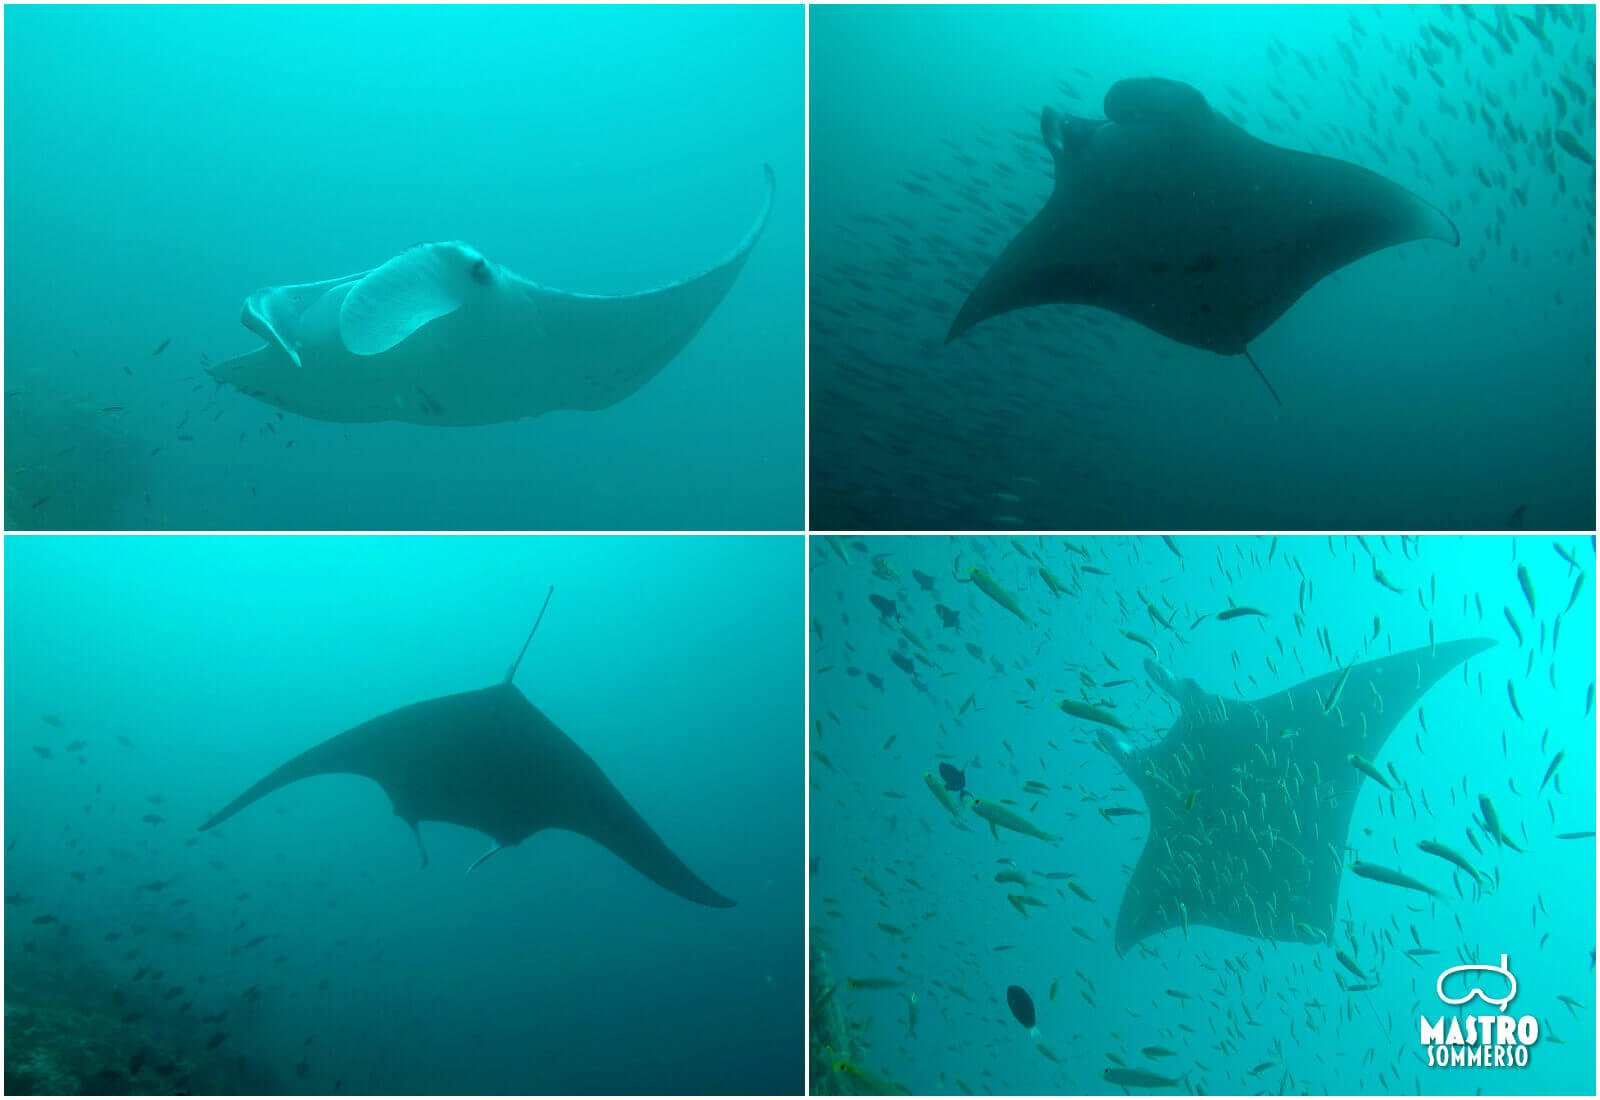 mastro-sommerso-dharavandhoo-maldive-manta-inVolo-ty-2